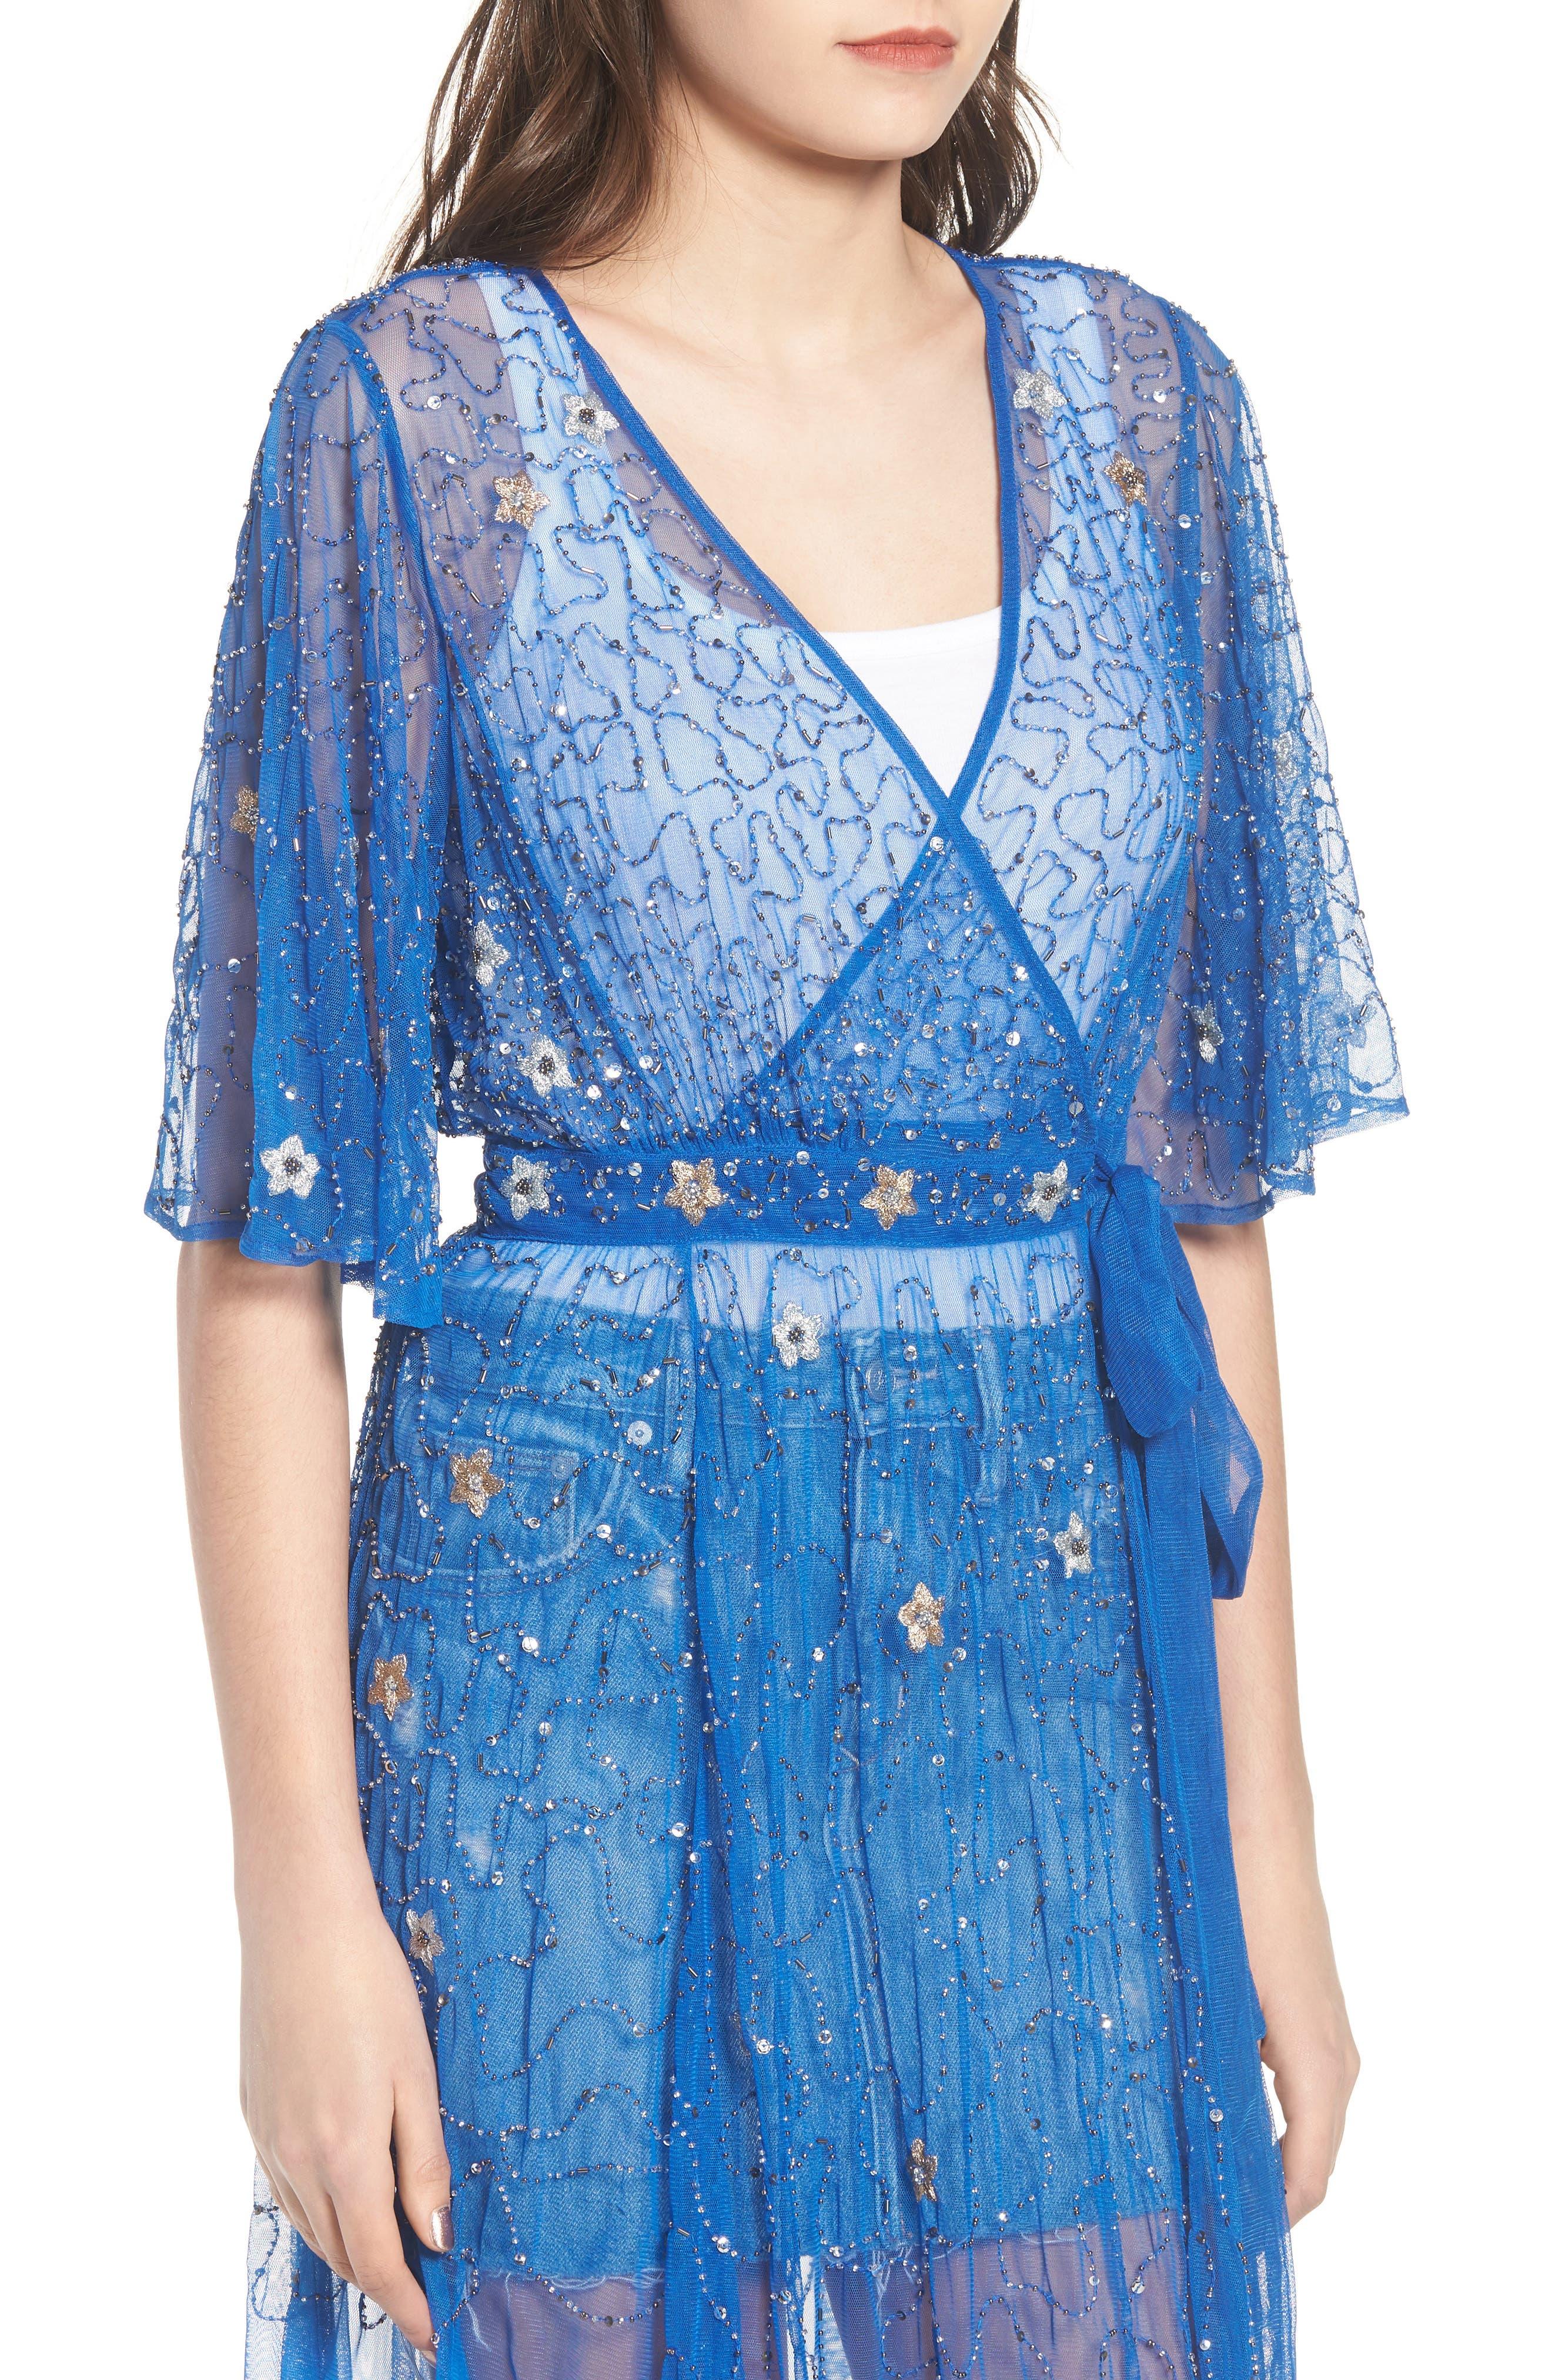 Stargazer Kimono,                             Alternate thumbnail 4, color,                             Lapiz Blue